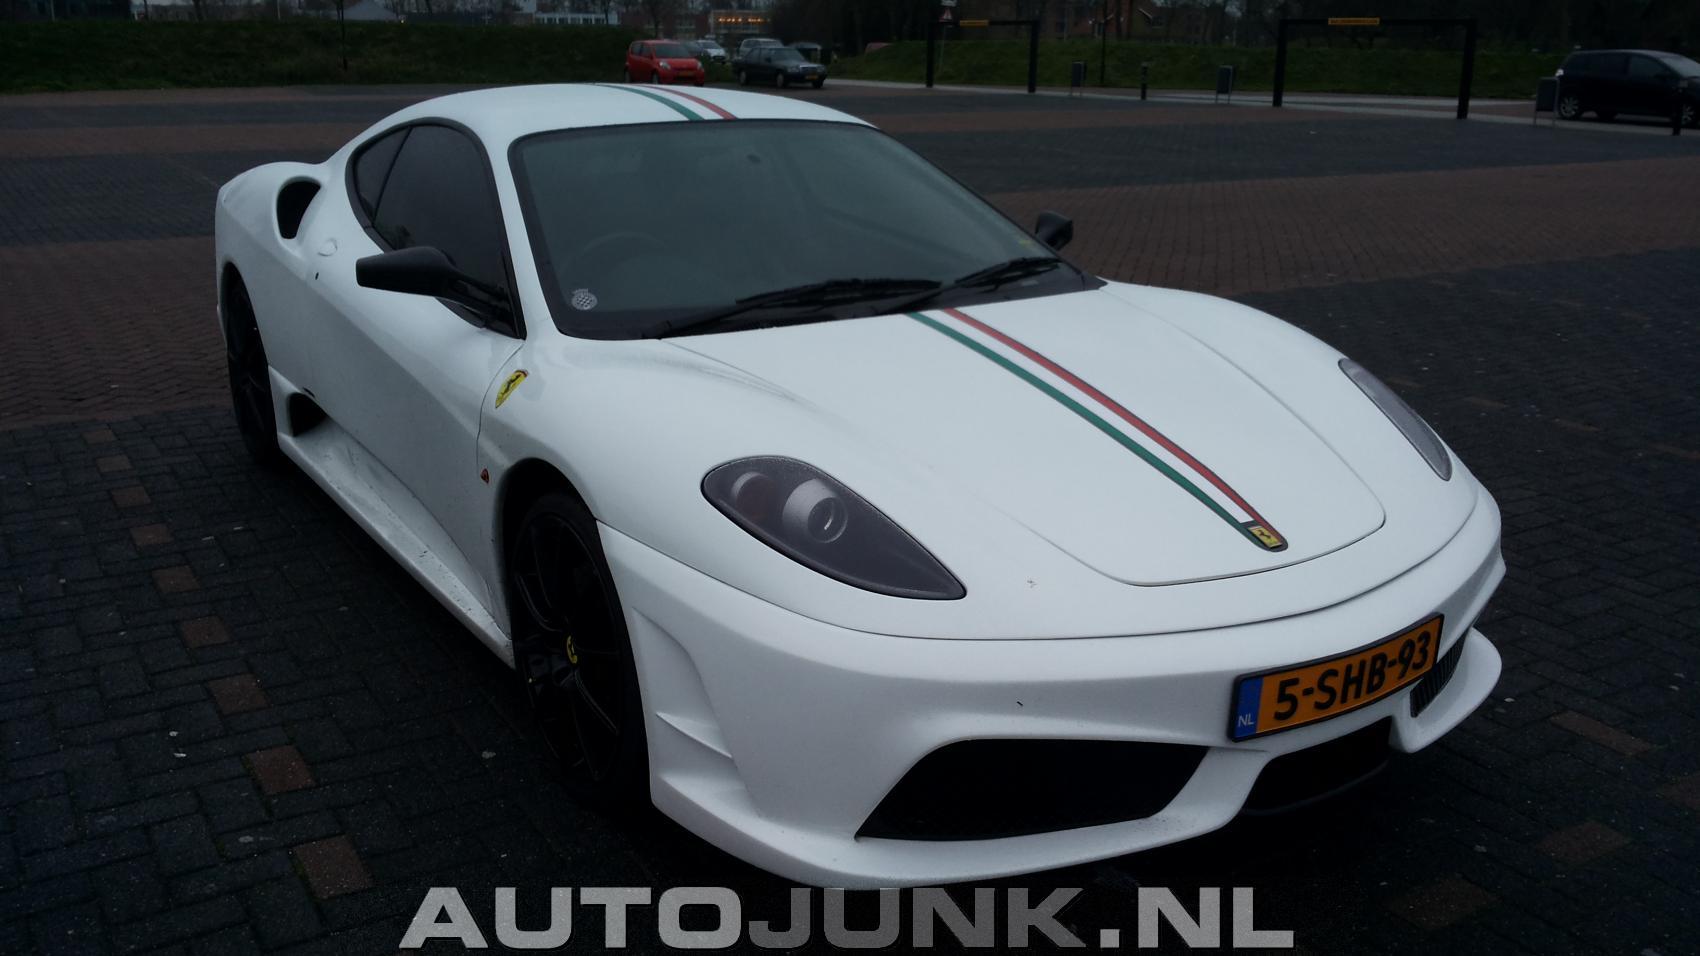 Ferrari Replica For Sale Uk Cars For Sale Newsnow